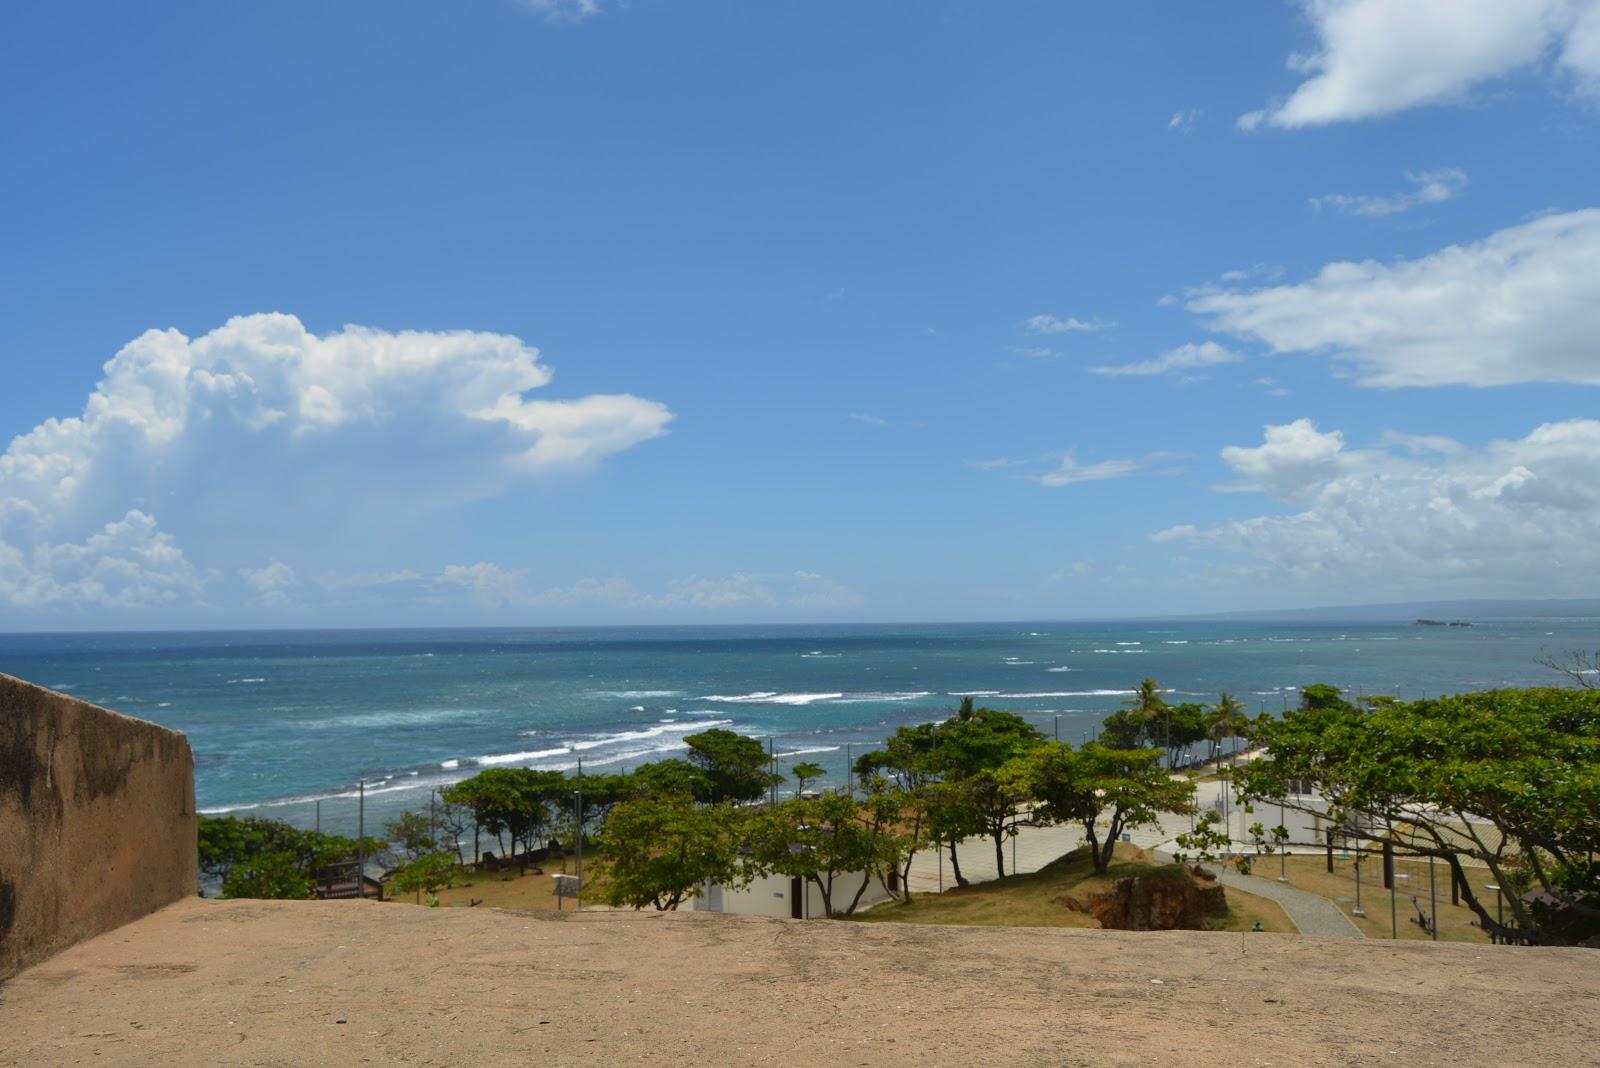 san felipe, dom rep, dominican republic, caribbean, puerto plata, travelling, holiday, riu hotels, riu bachata, fort